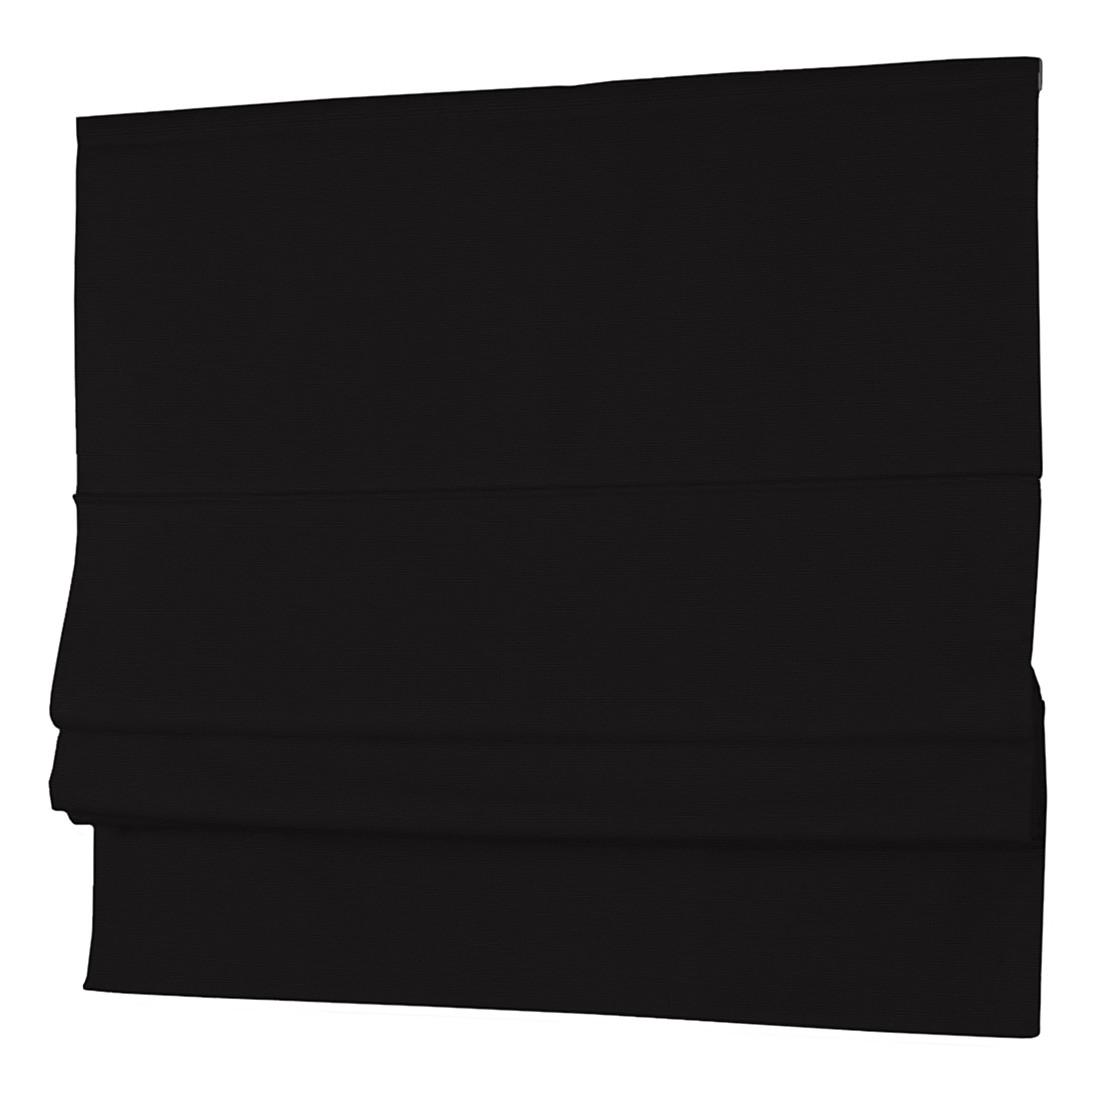 Raffrollo Cotton Panama – Schwarz – 160 x 170 cm, Dekoria jetzt kaufen